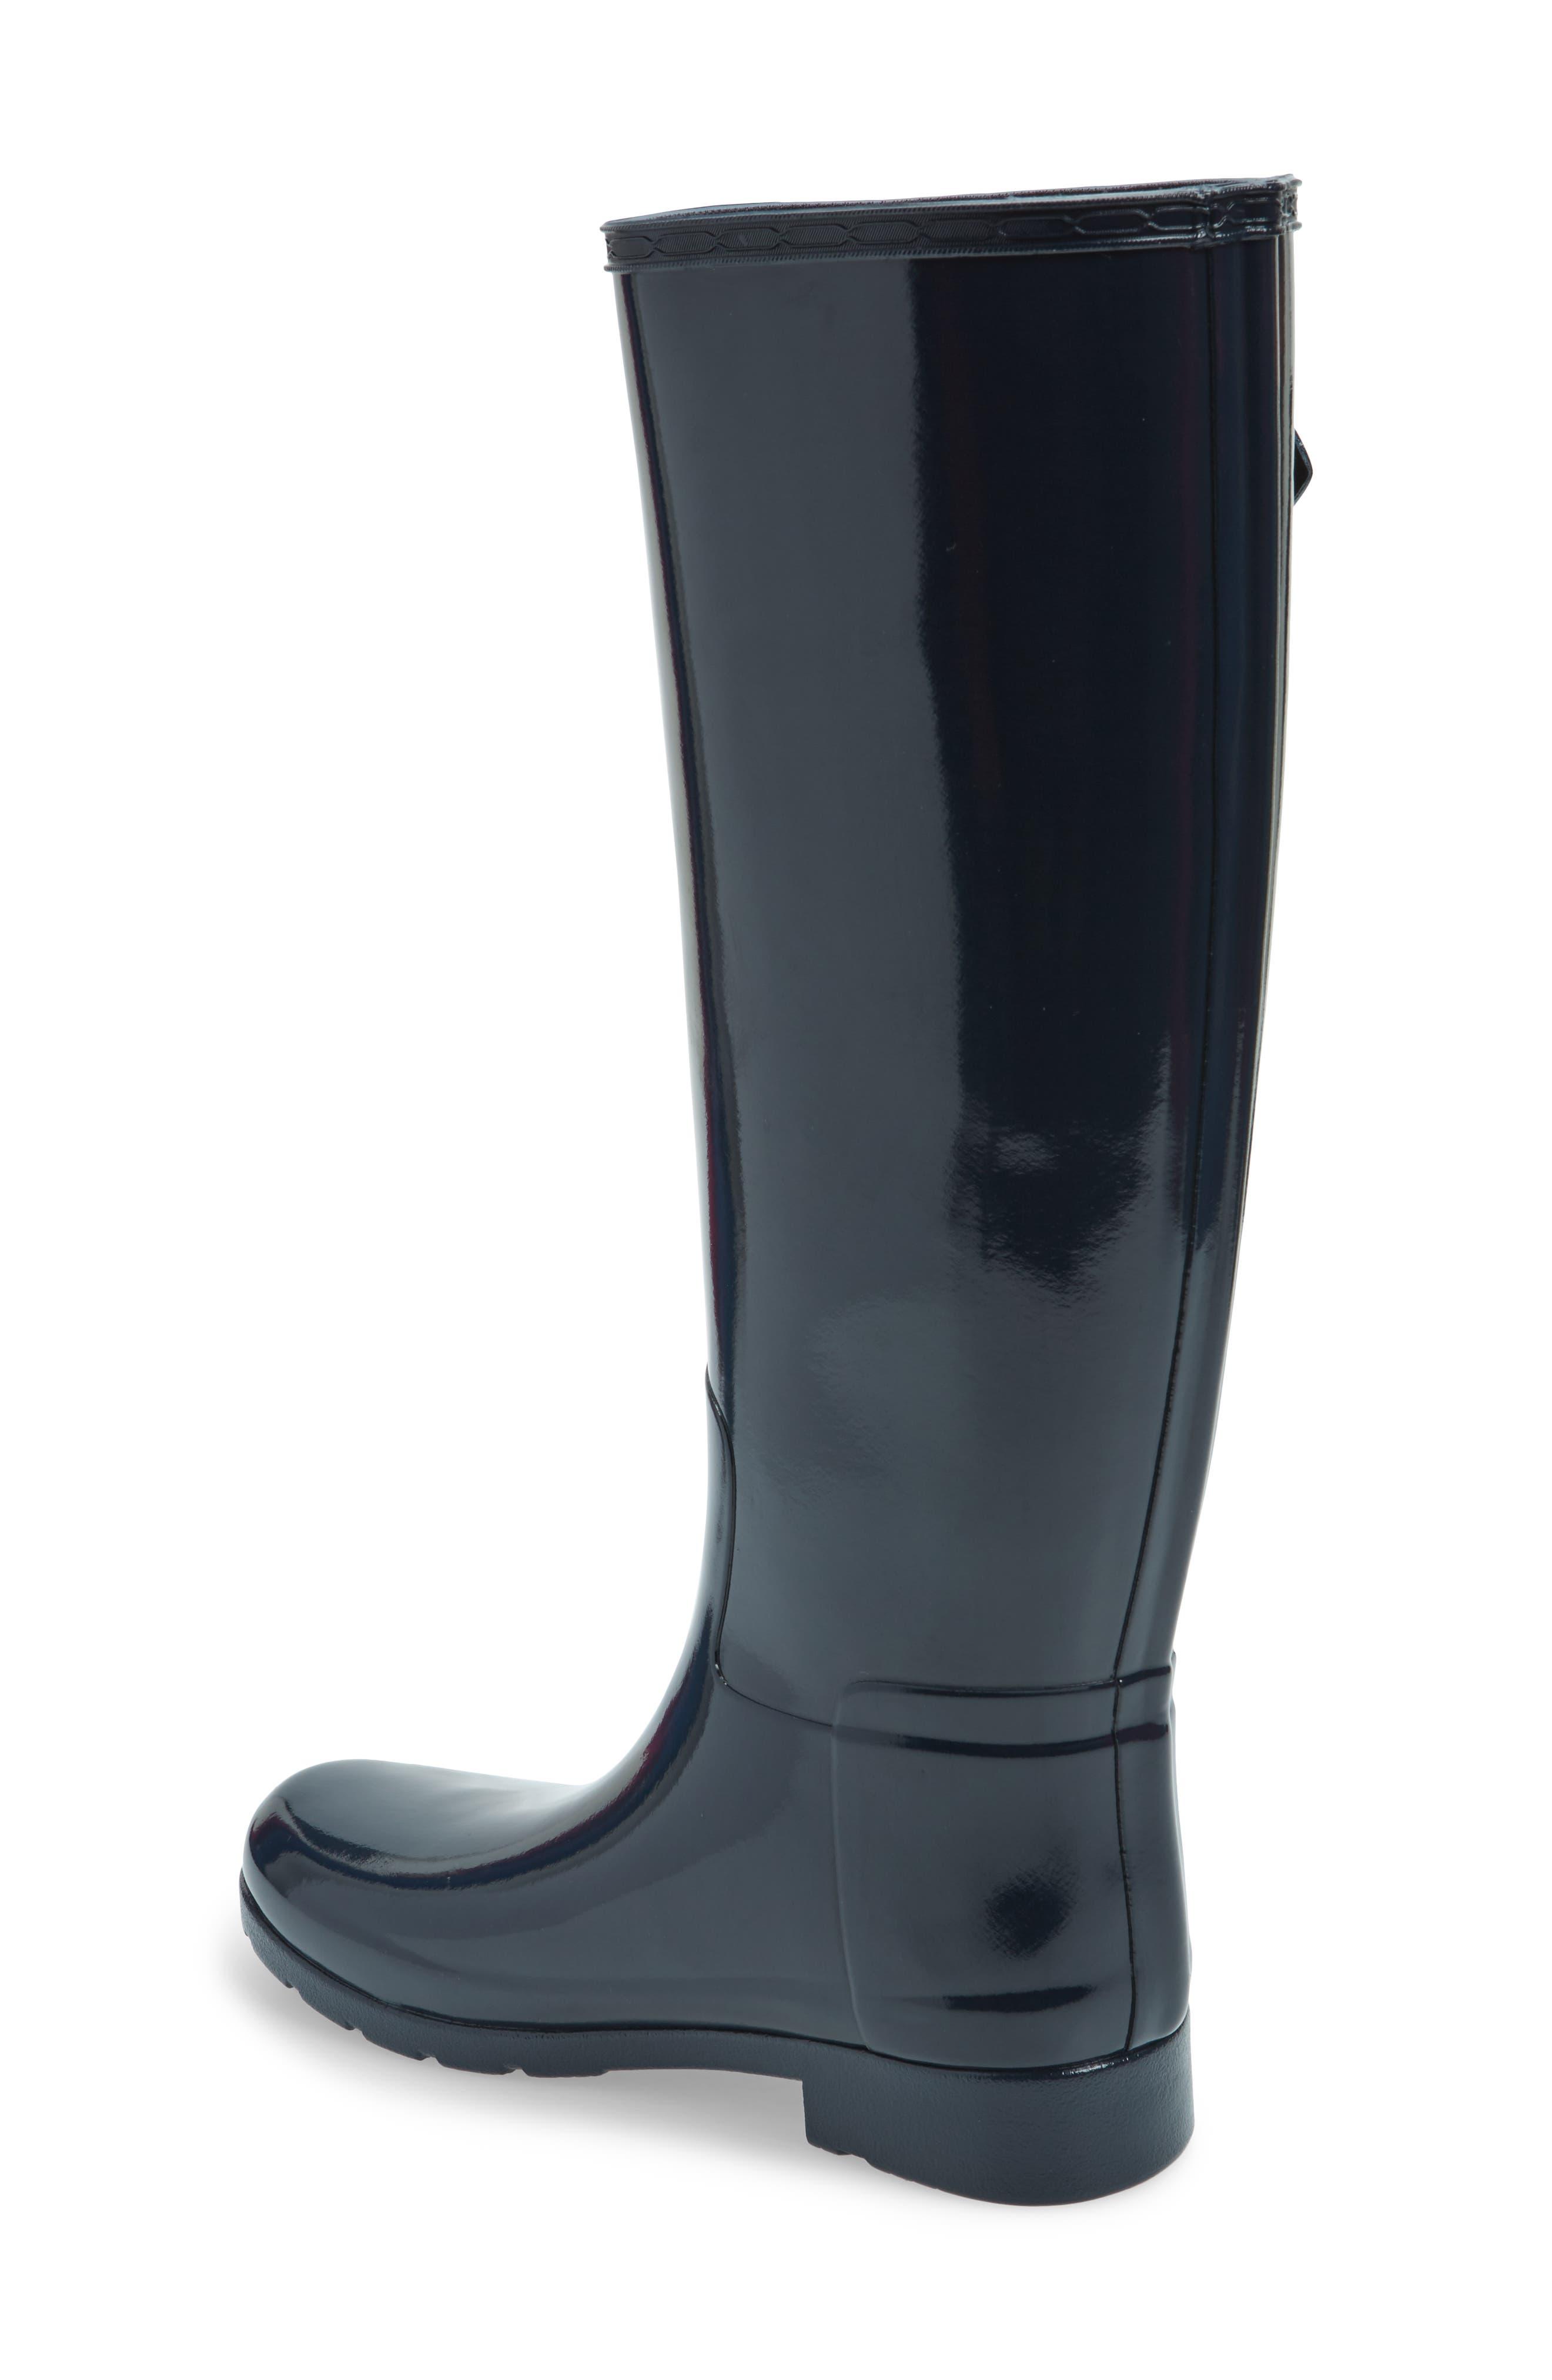 Alternate Image 2  - Hunter 'Original Refined' High Gloss Rain Boot (Women)